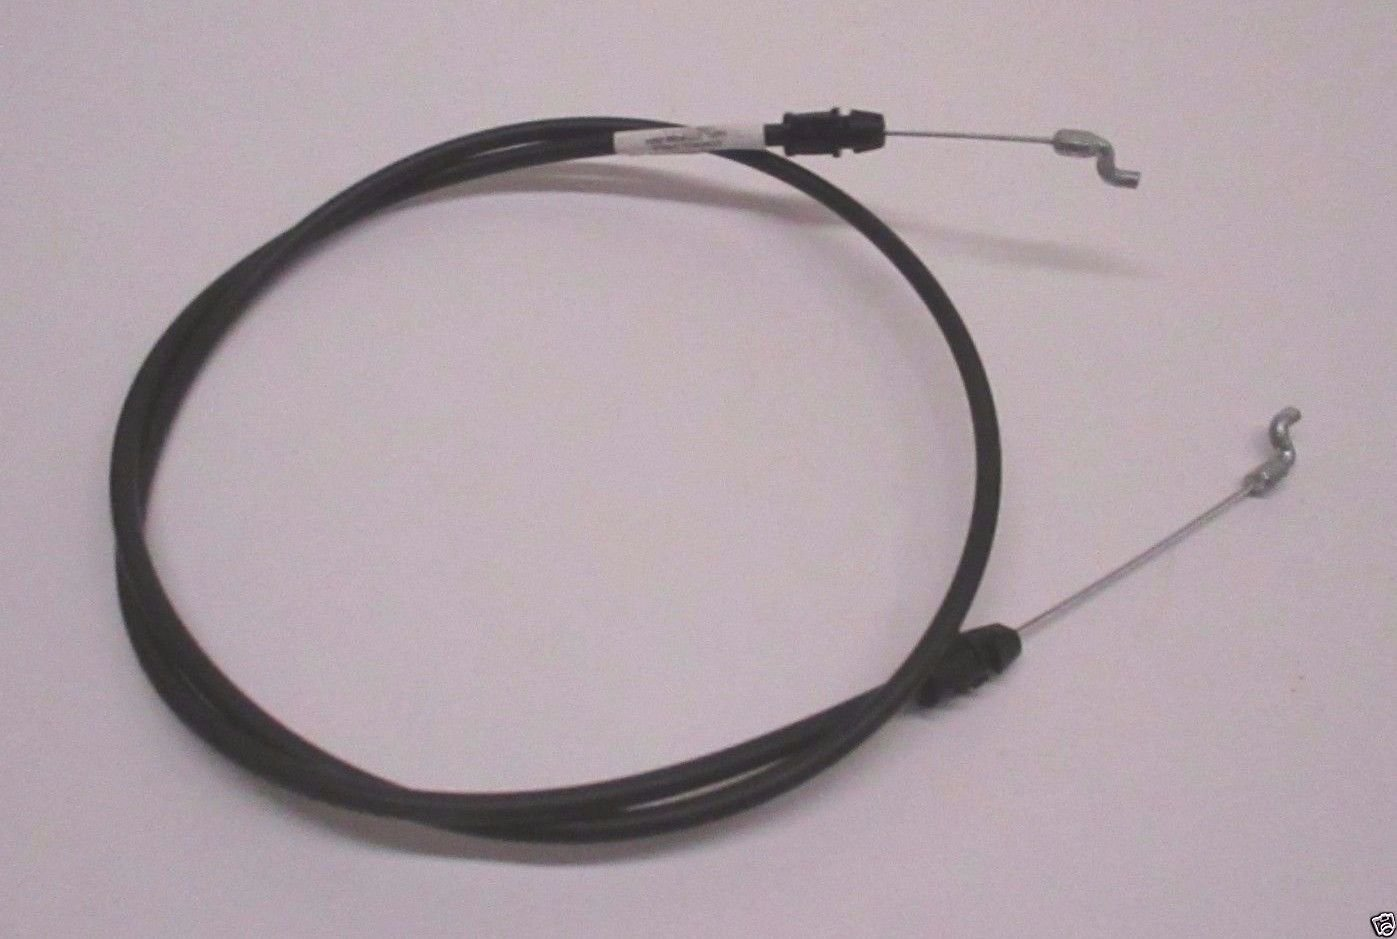 Genuine MTD 946-0554 Control Cable Fits Bolens Columbia Craftsman Troy-Bilt OEM